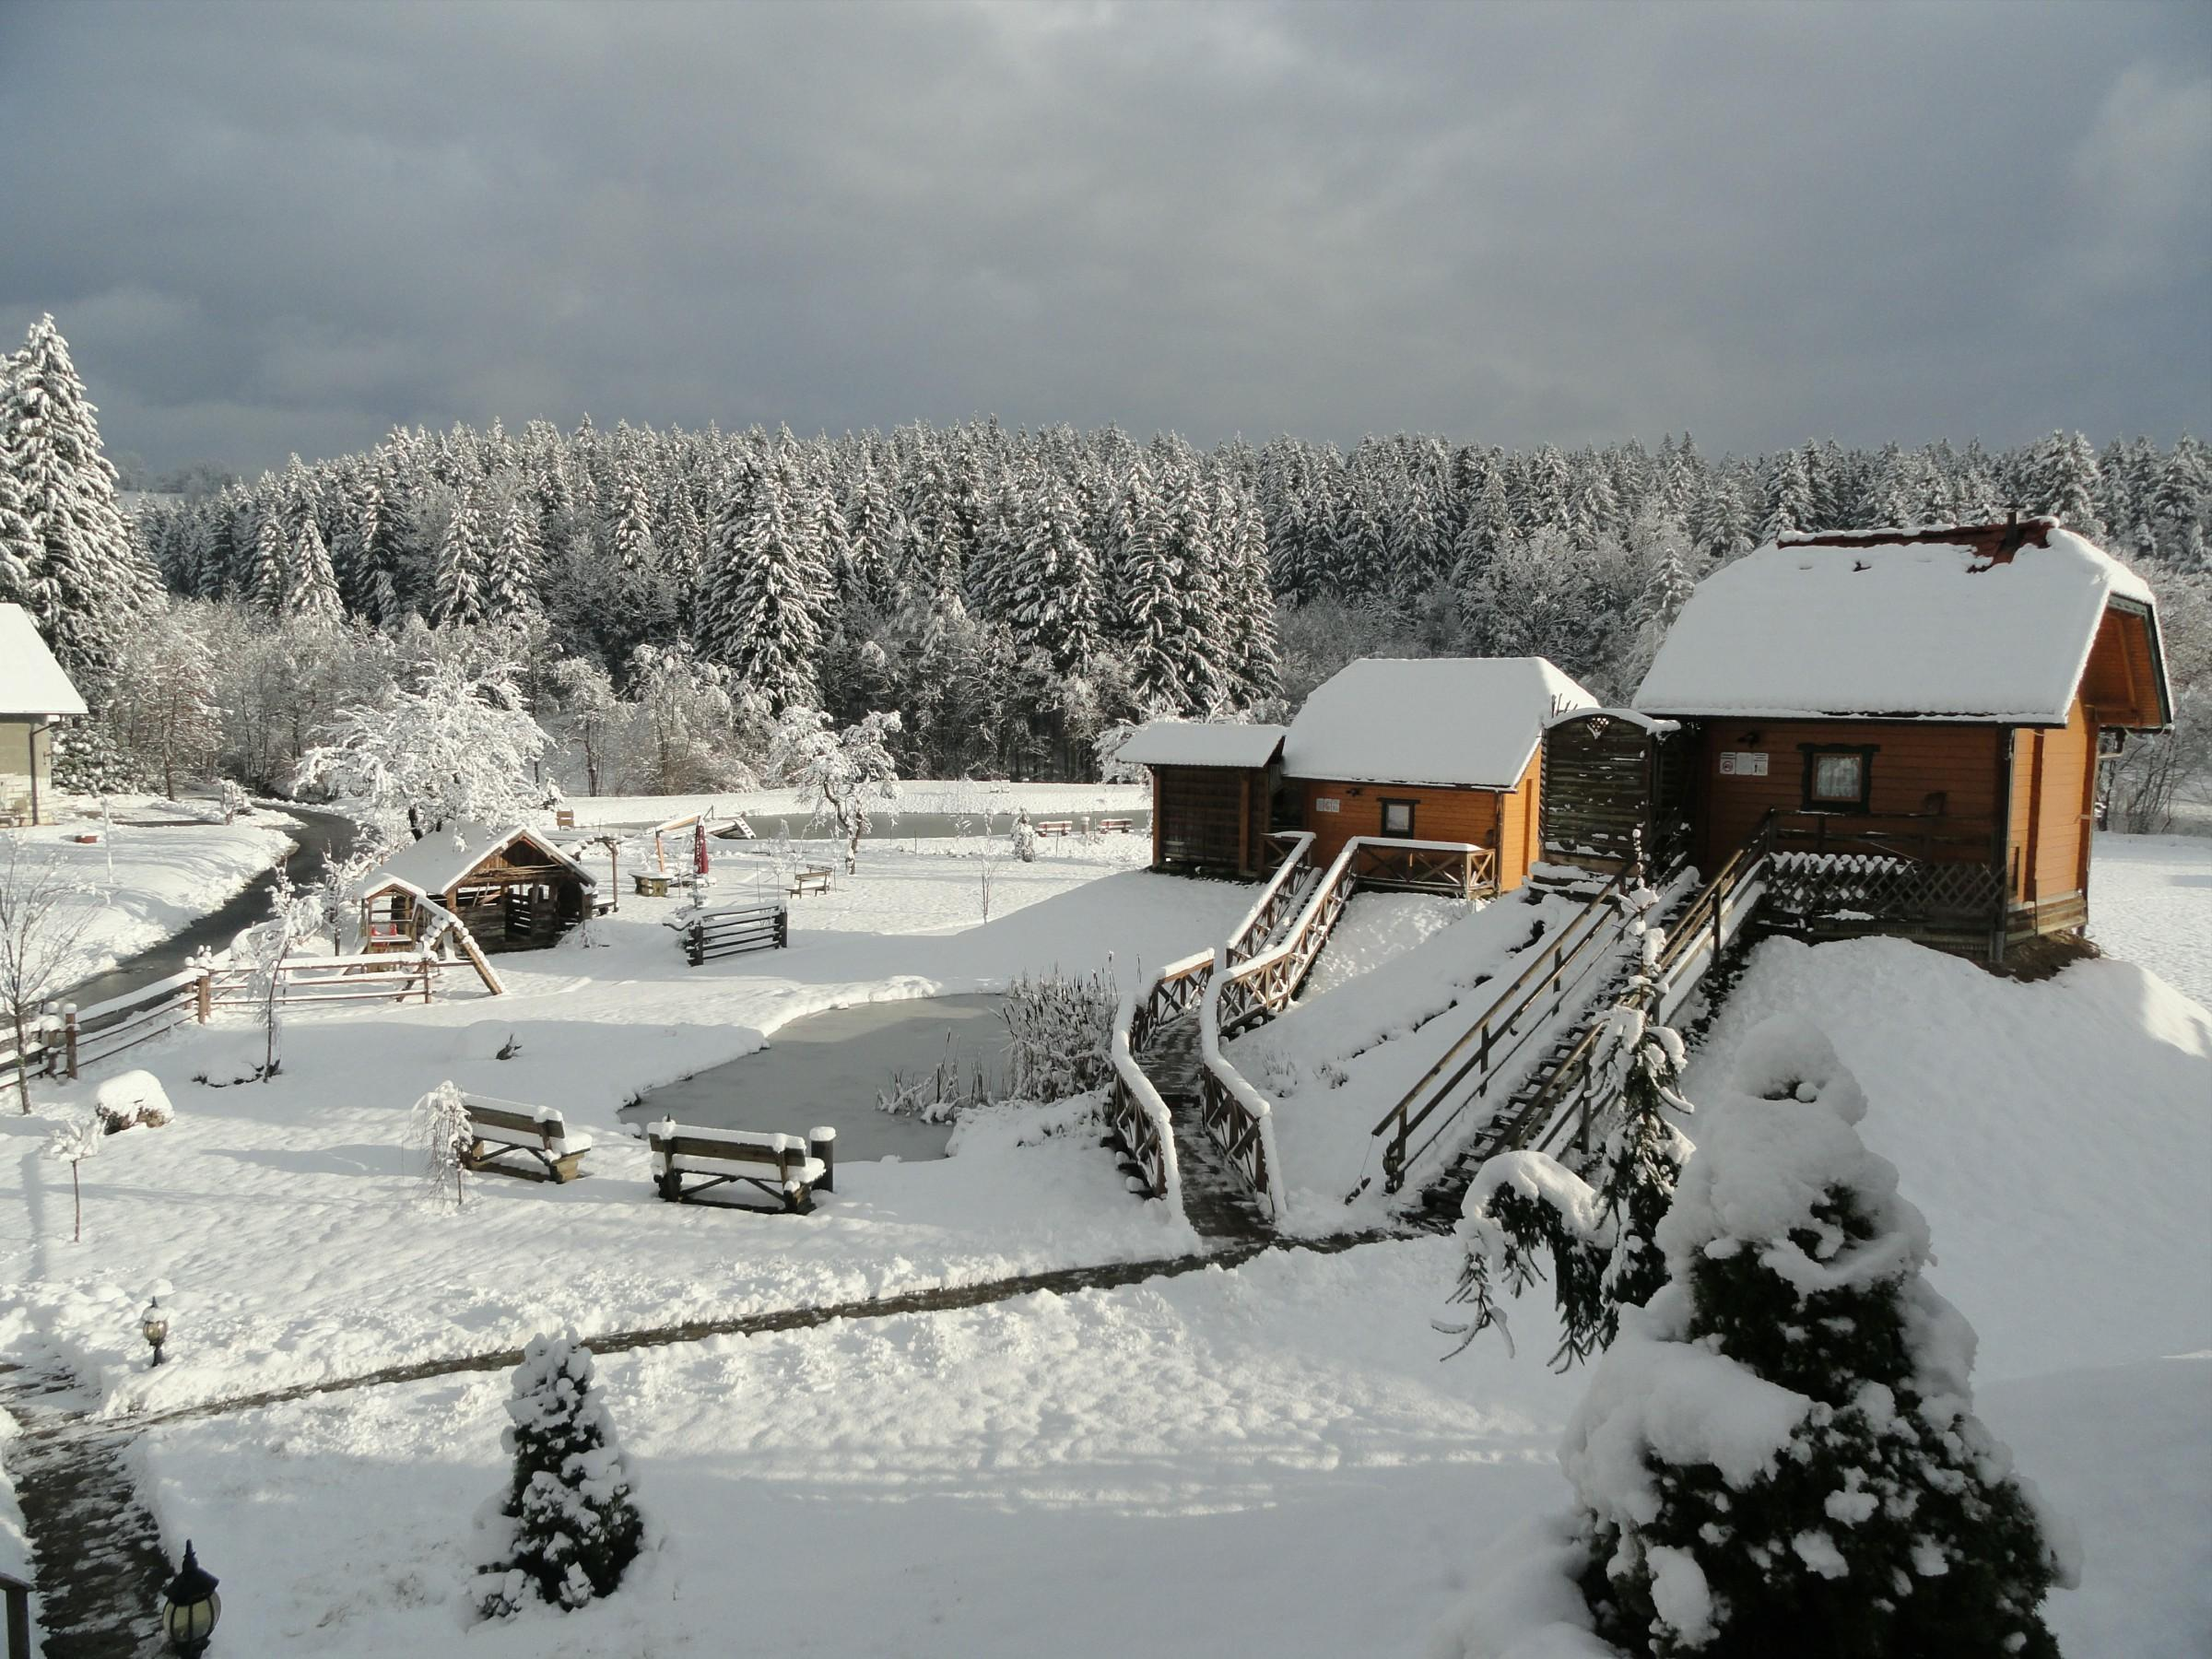 FormatFactoryA. Koroτec-okolica, foto arhiv Koroτec, Savinjske Alpe